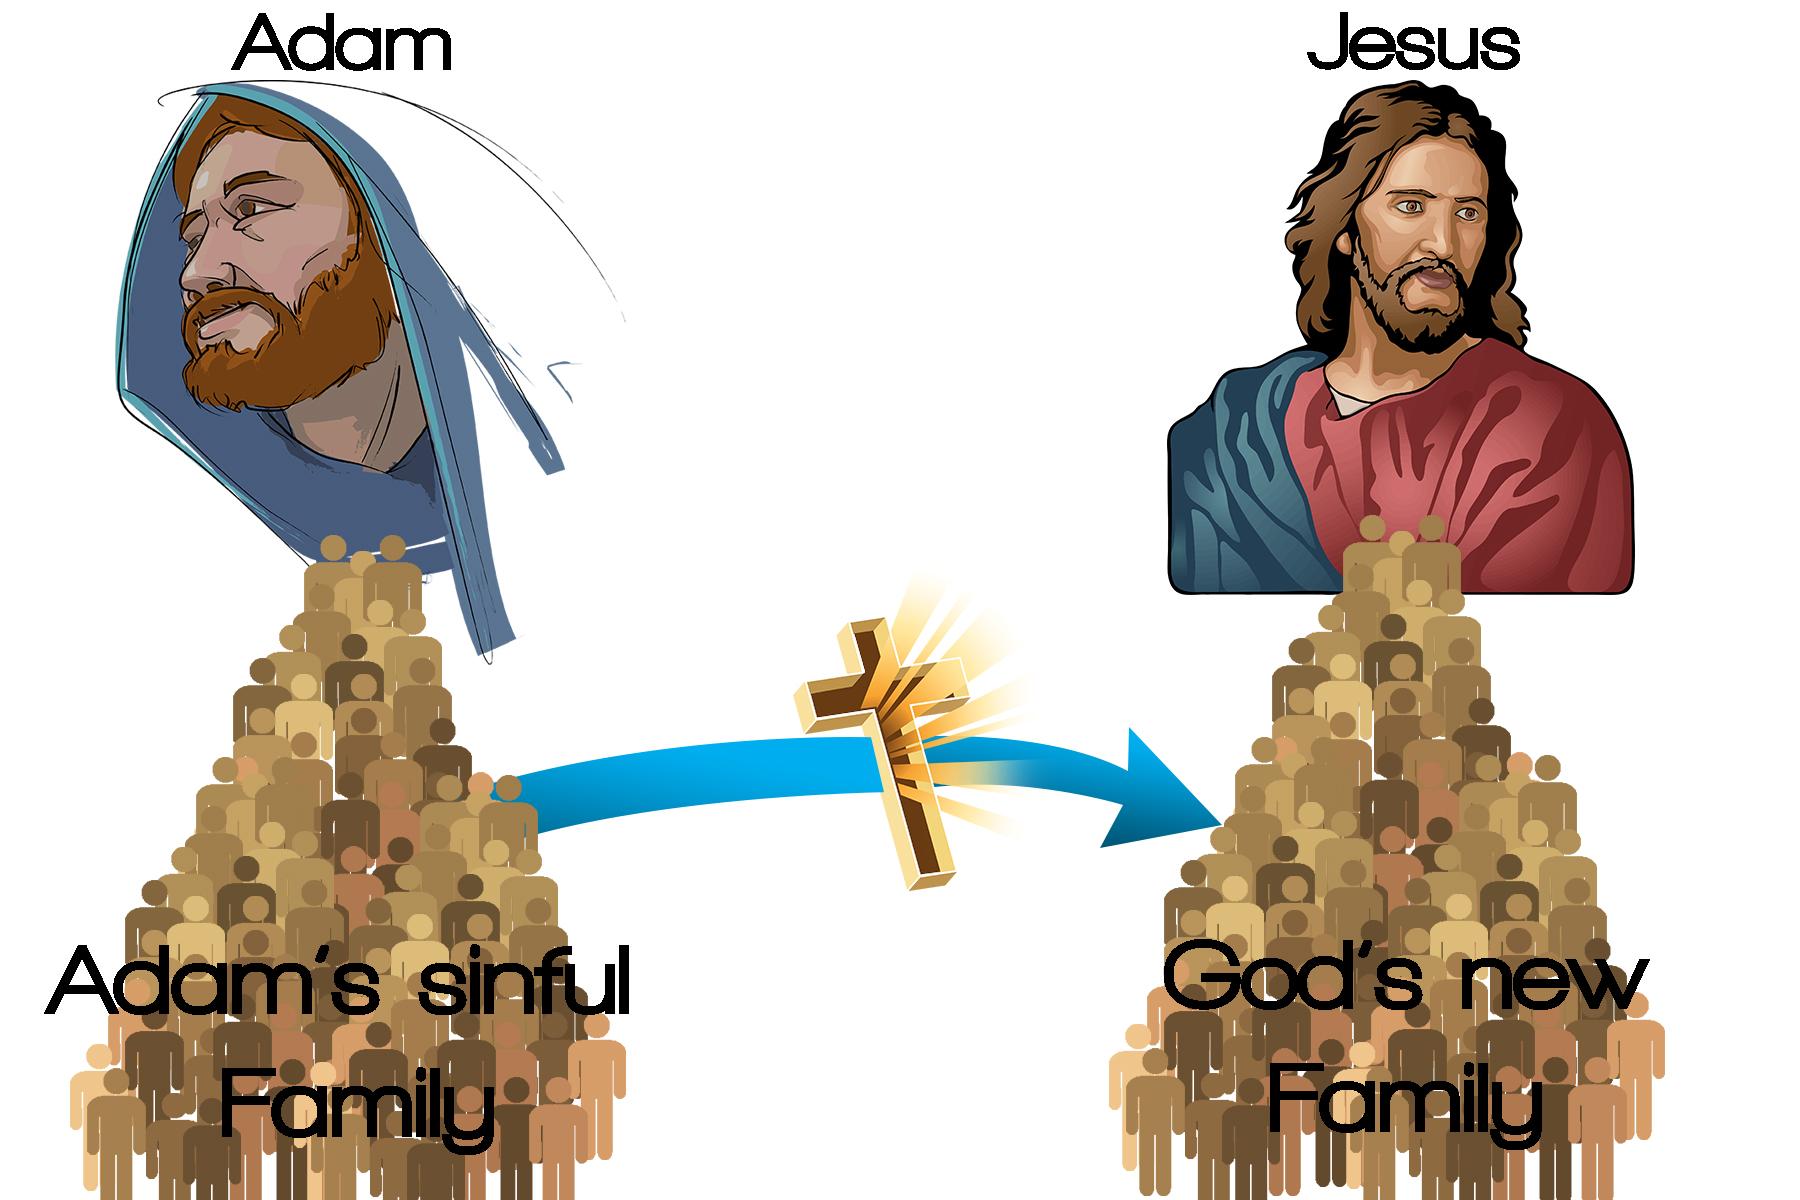 1st Adam and 2nd Adam ادم الاول و ادم الثاني